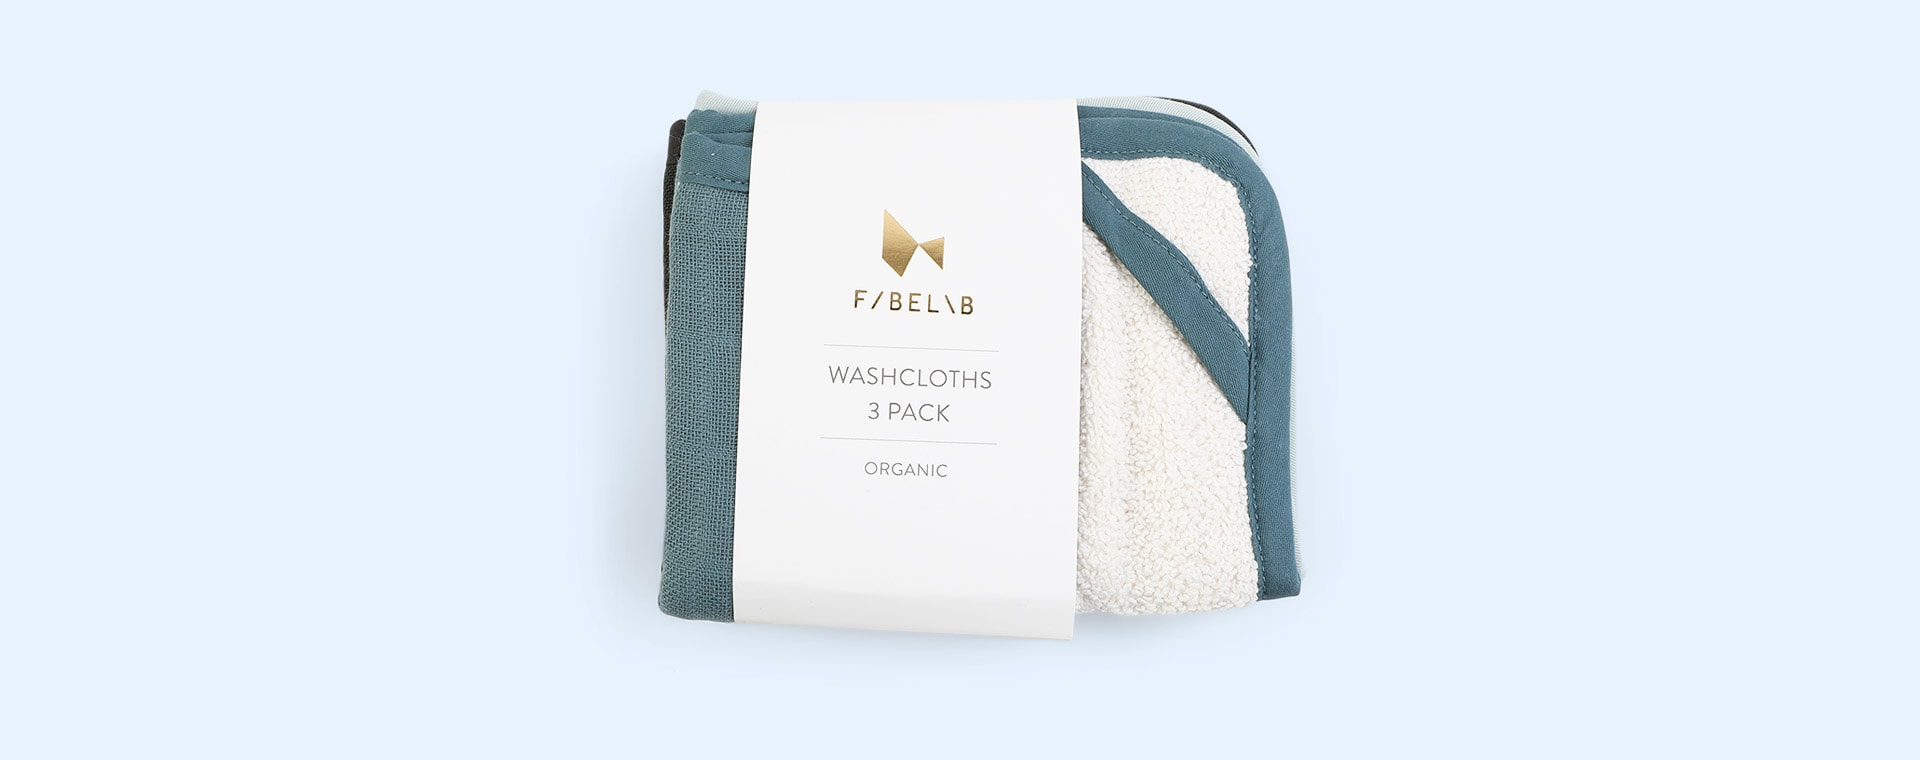 Moon Beam Fabelab 3-Pack Washcloth